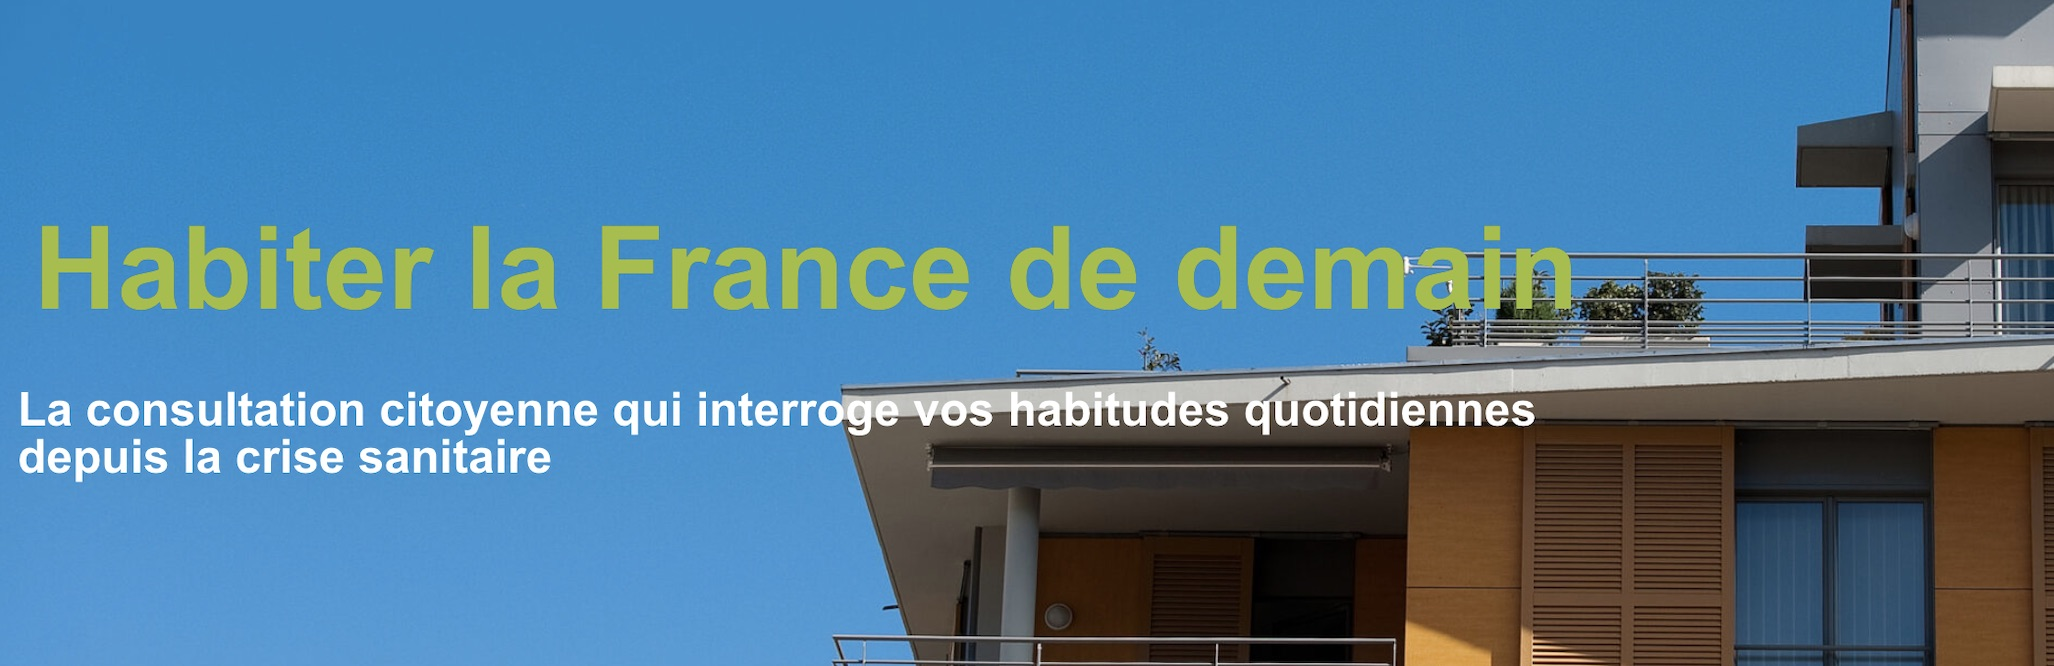 Habiter France demain